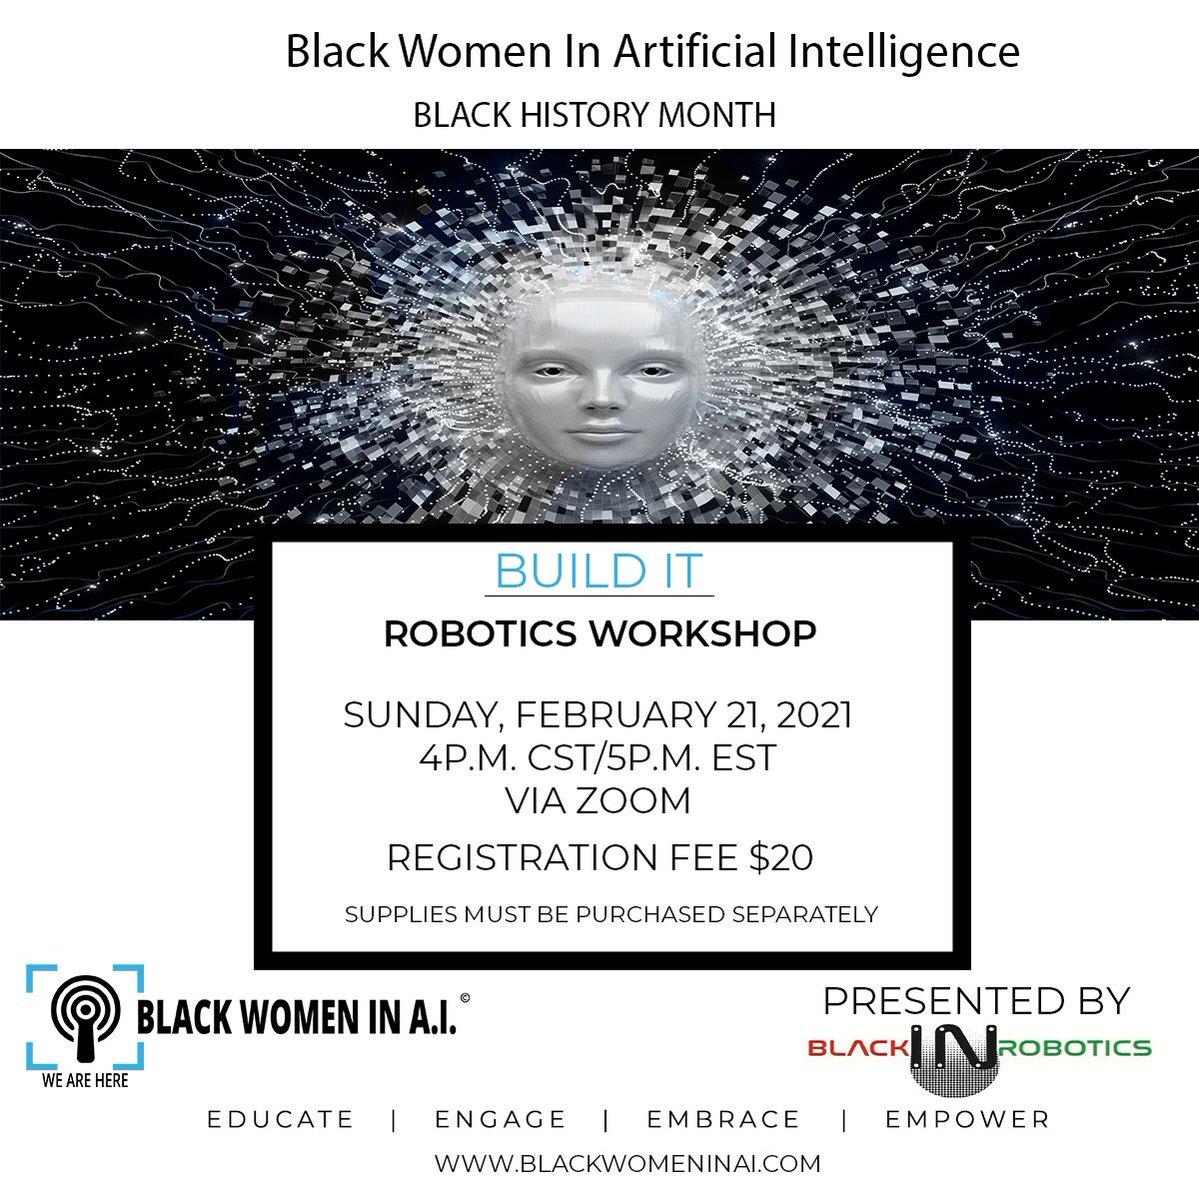 Black History Month Event Alert -Black Women In Artificial Intelligence - Robotics Workshop in partnership with @BlackInRobotics February 21, 2021. Registration details will be posted soon. #BlackHistory #Robotics #STEM #BlackInRobotics #technology #BWIAI @BlackWomenInAI